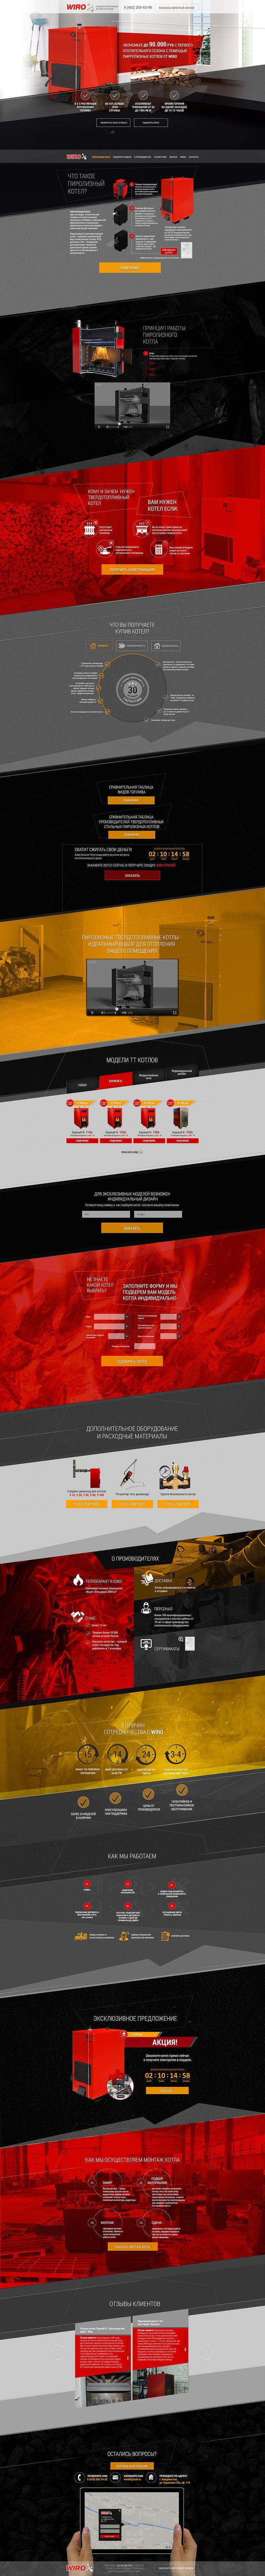 WIRO  #landing, #page, #design, #web, #HTML5, #photoshop, #website